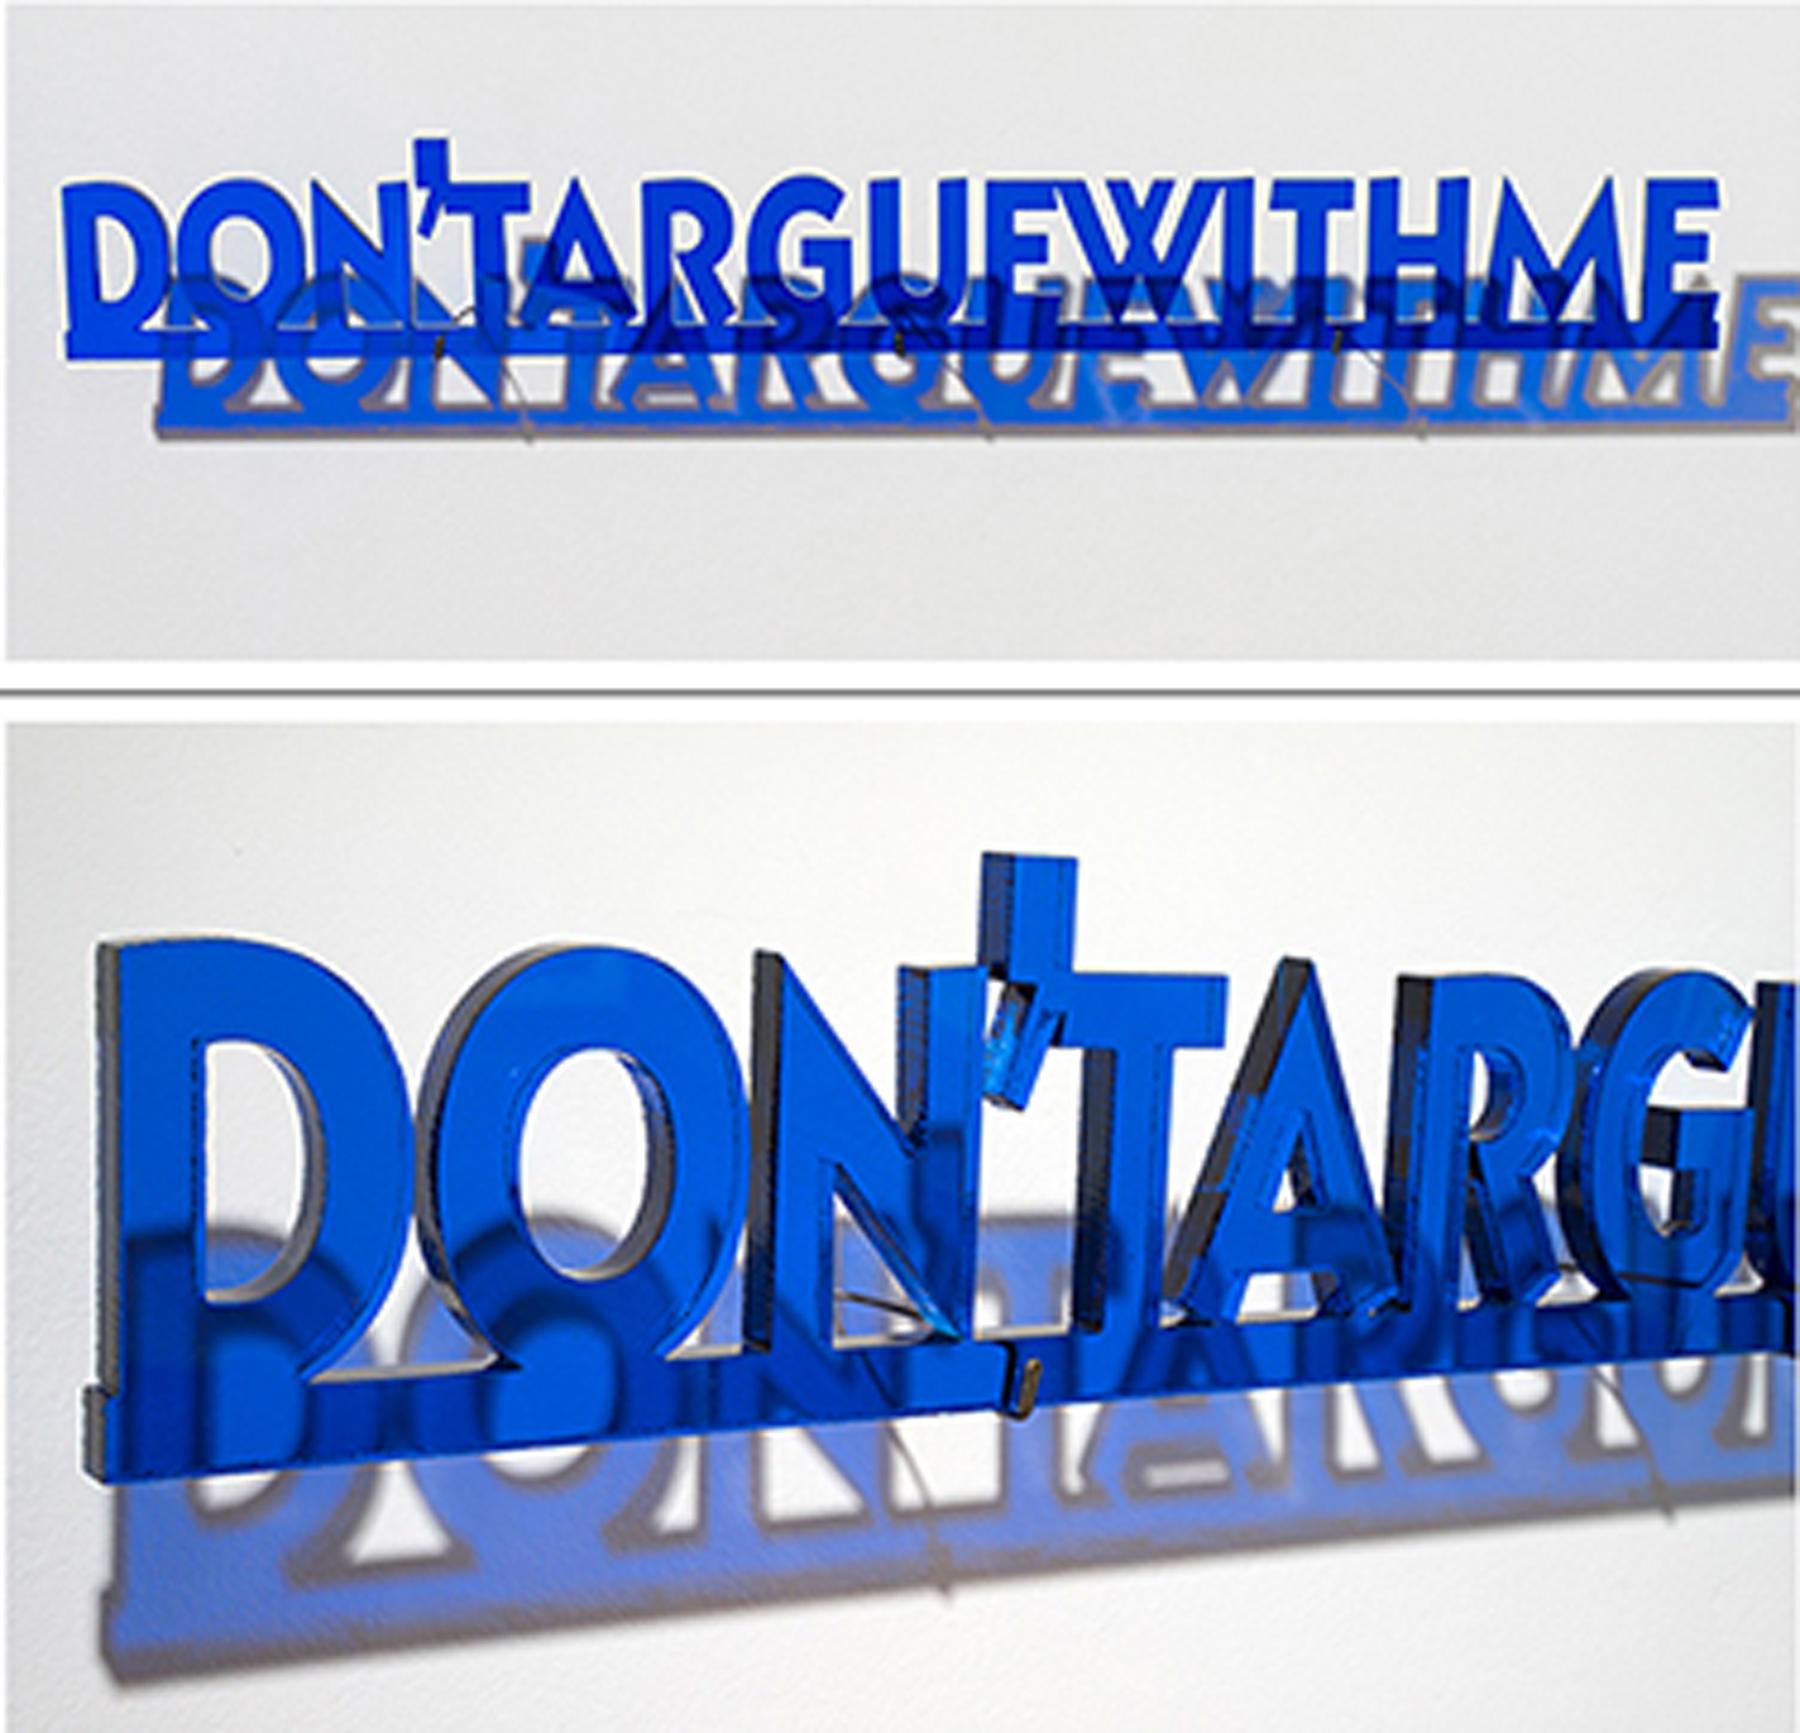 Don't Argue With Me, 3 x 36 inches / 7.5 x 91 cm, plexiglass, edition 1/7, 2014